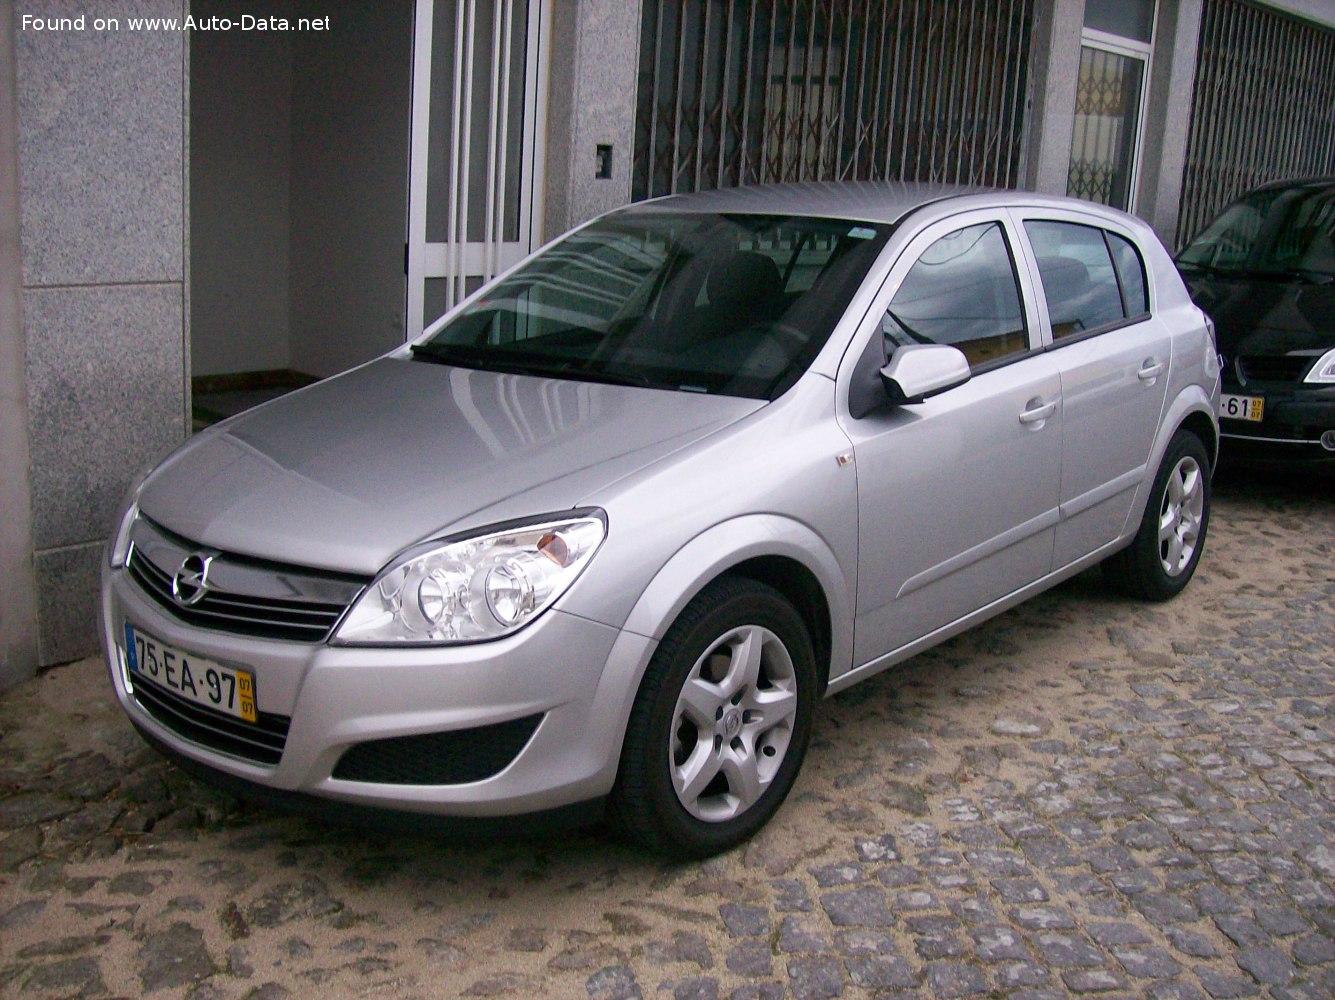 2005 Opel Astra H 1 7 Cdti 80 Hp Technical Specs Data Fuel Consumption Dimensions